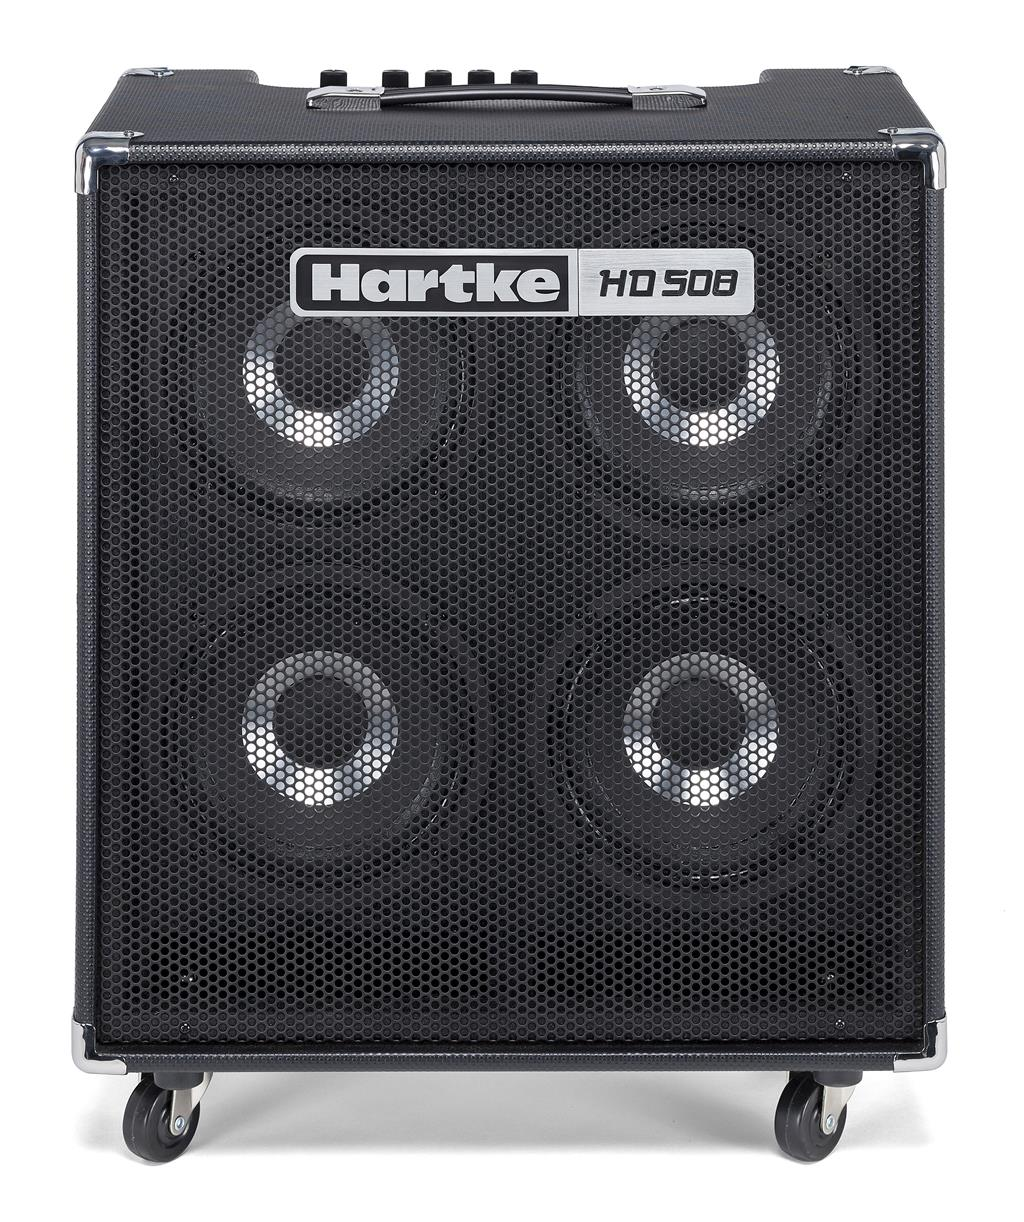 Hartke-HD508-Combo-4x8-500W-sku-2441269439007